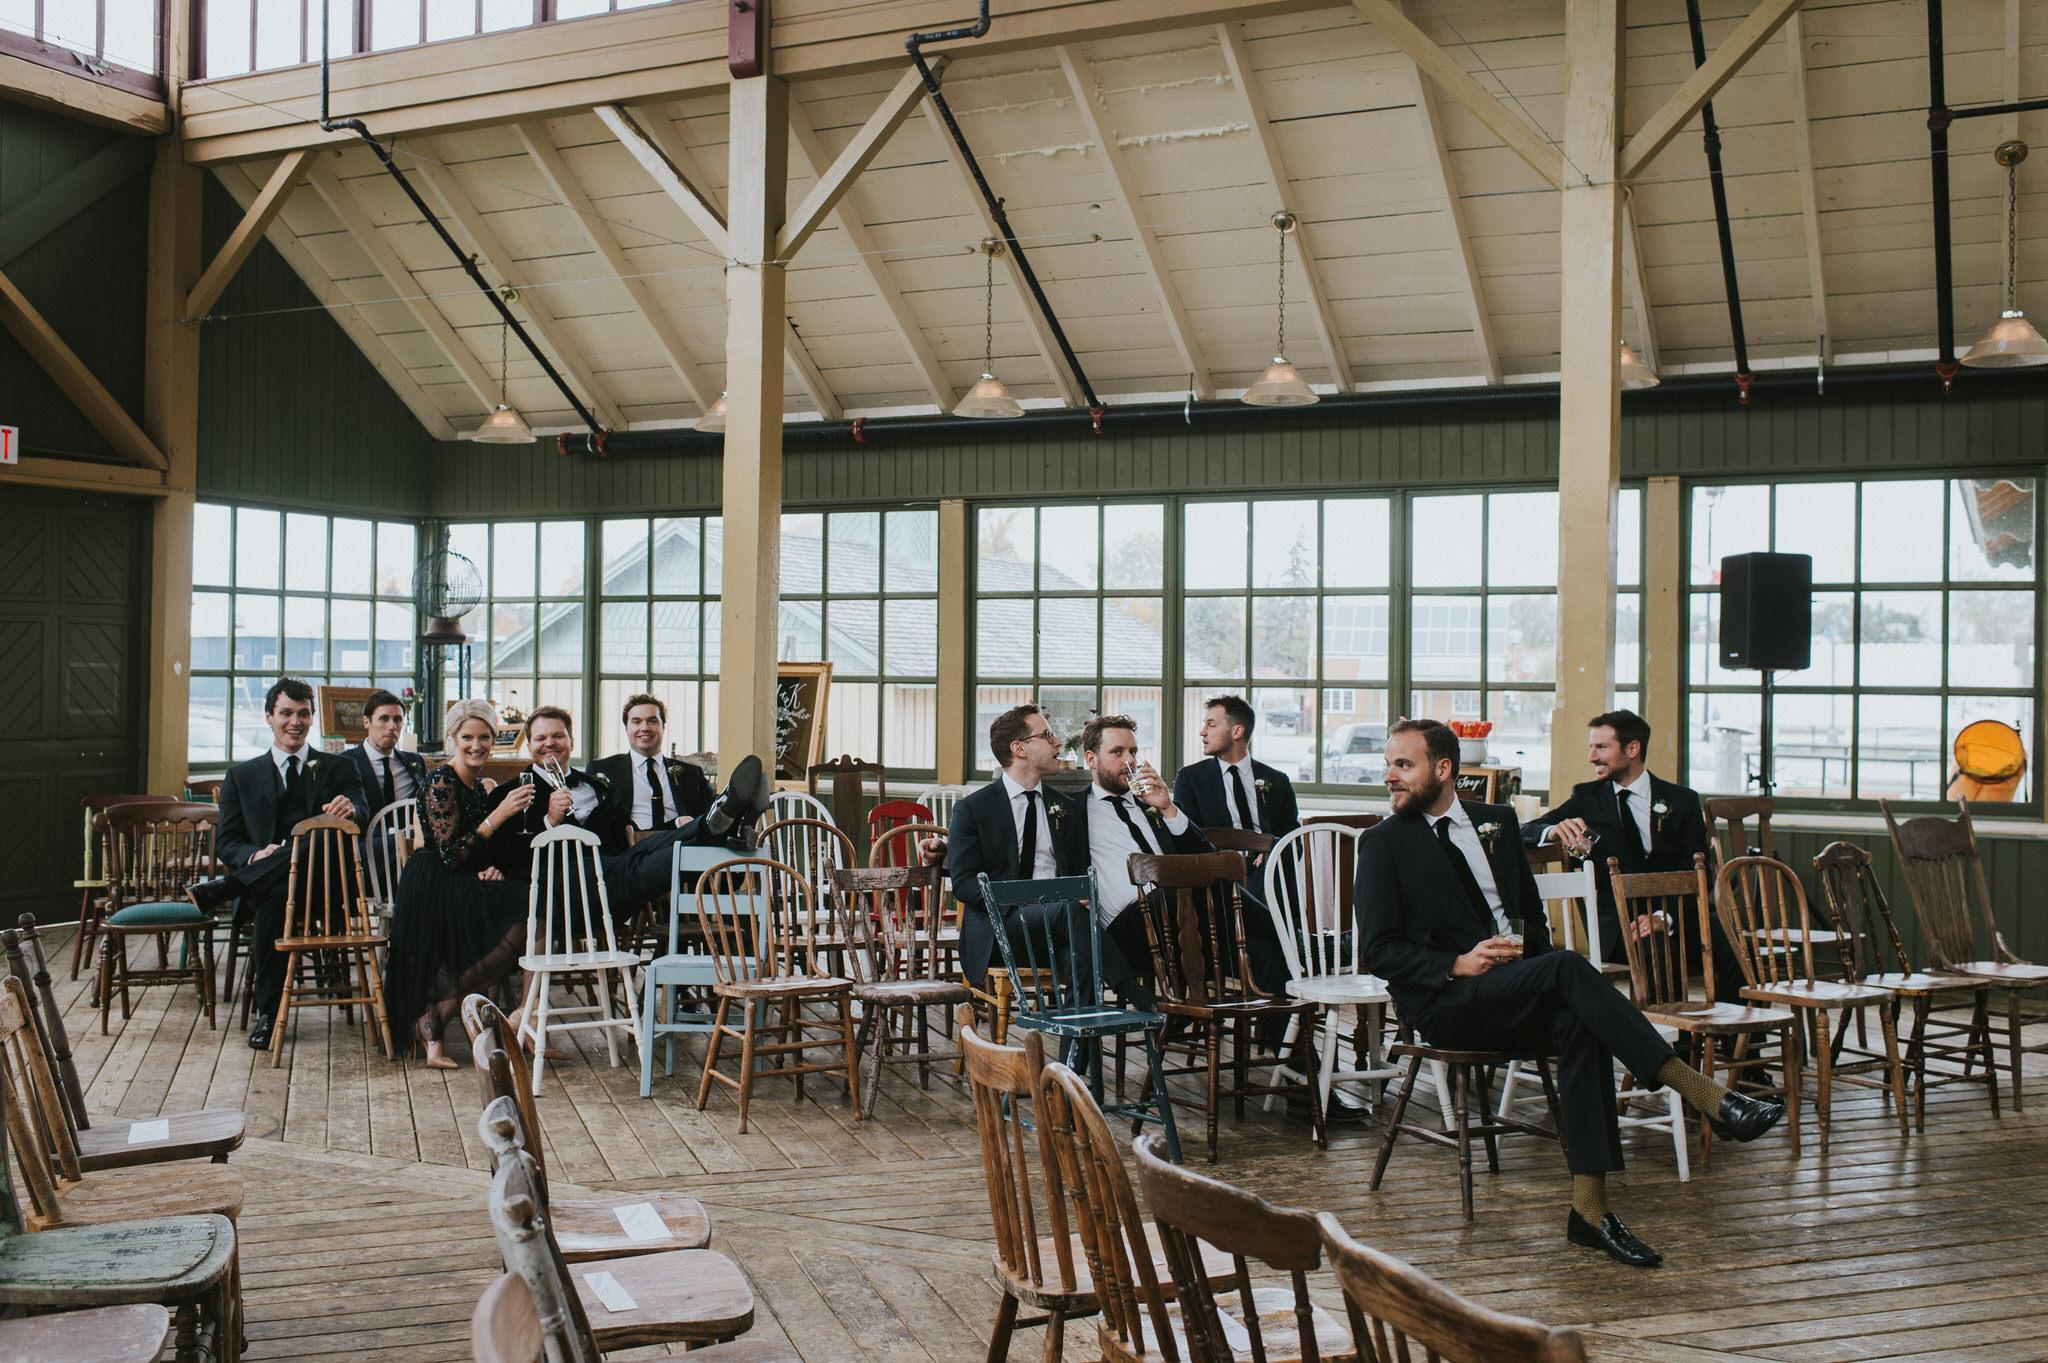 scarletoneillphotography_weddingphotography_prince edward county weddings103.JPG